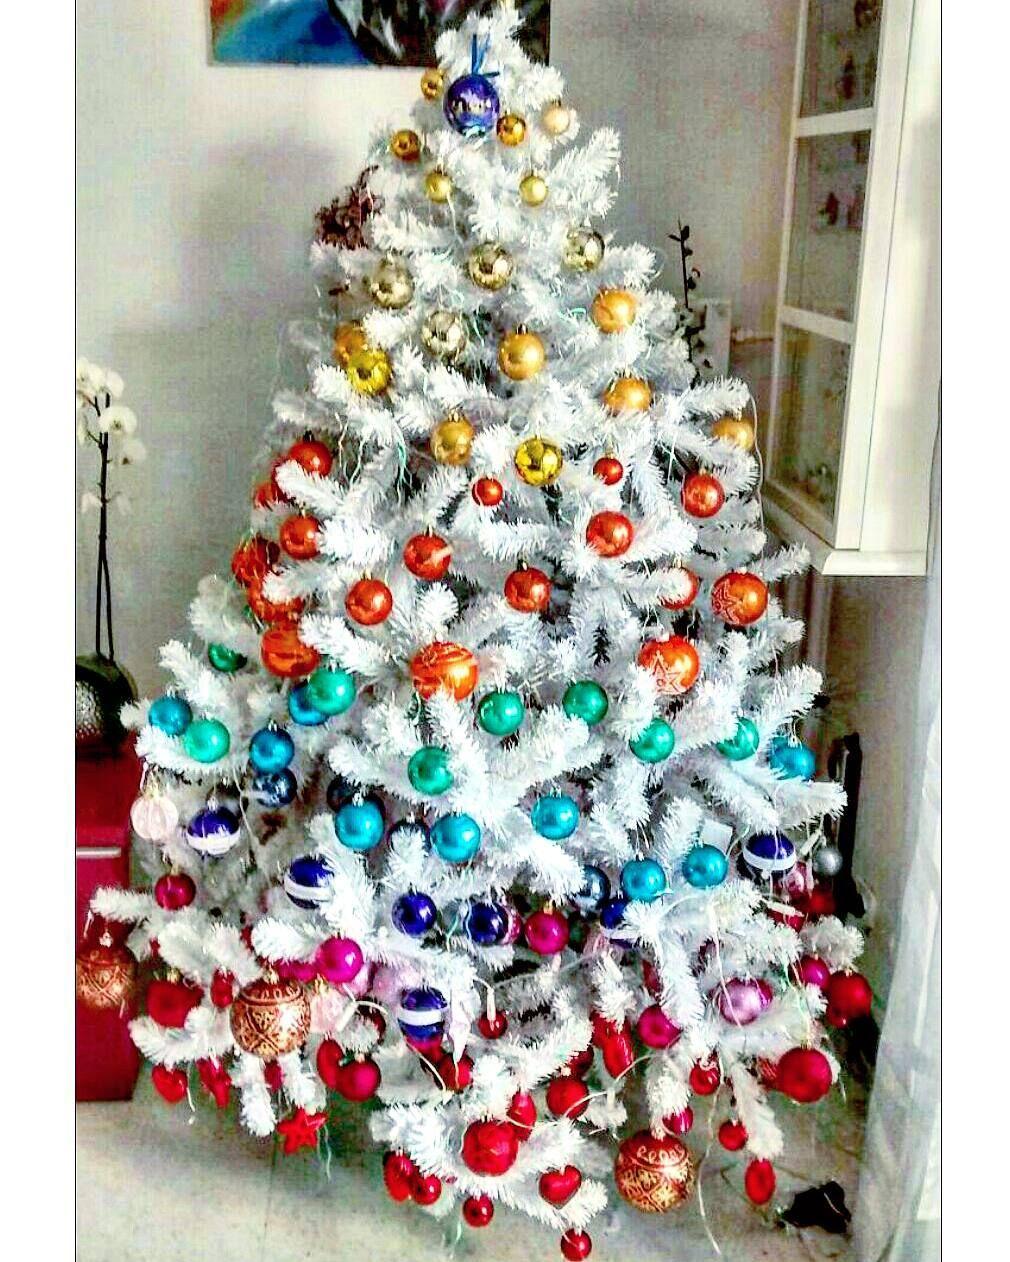 7 rainbow christmas trees that made us say wow martha stewart - Martha Stewart Christmas Trees